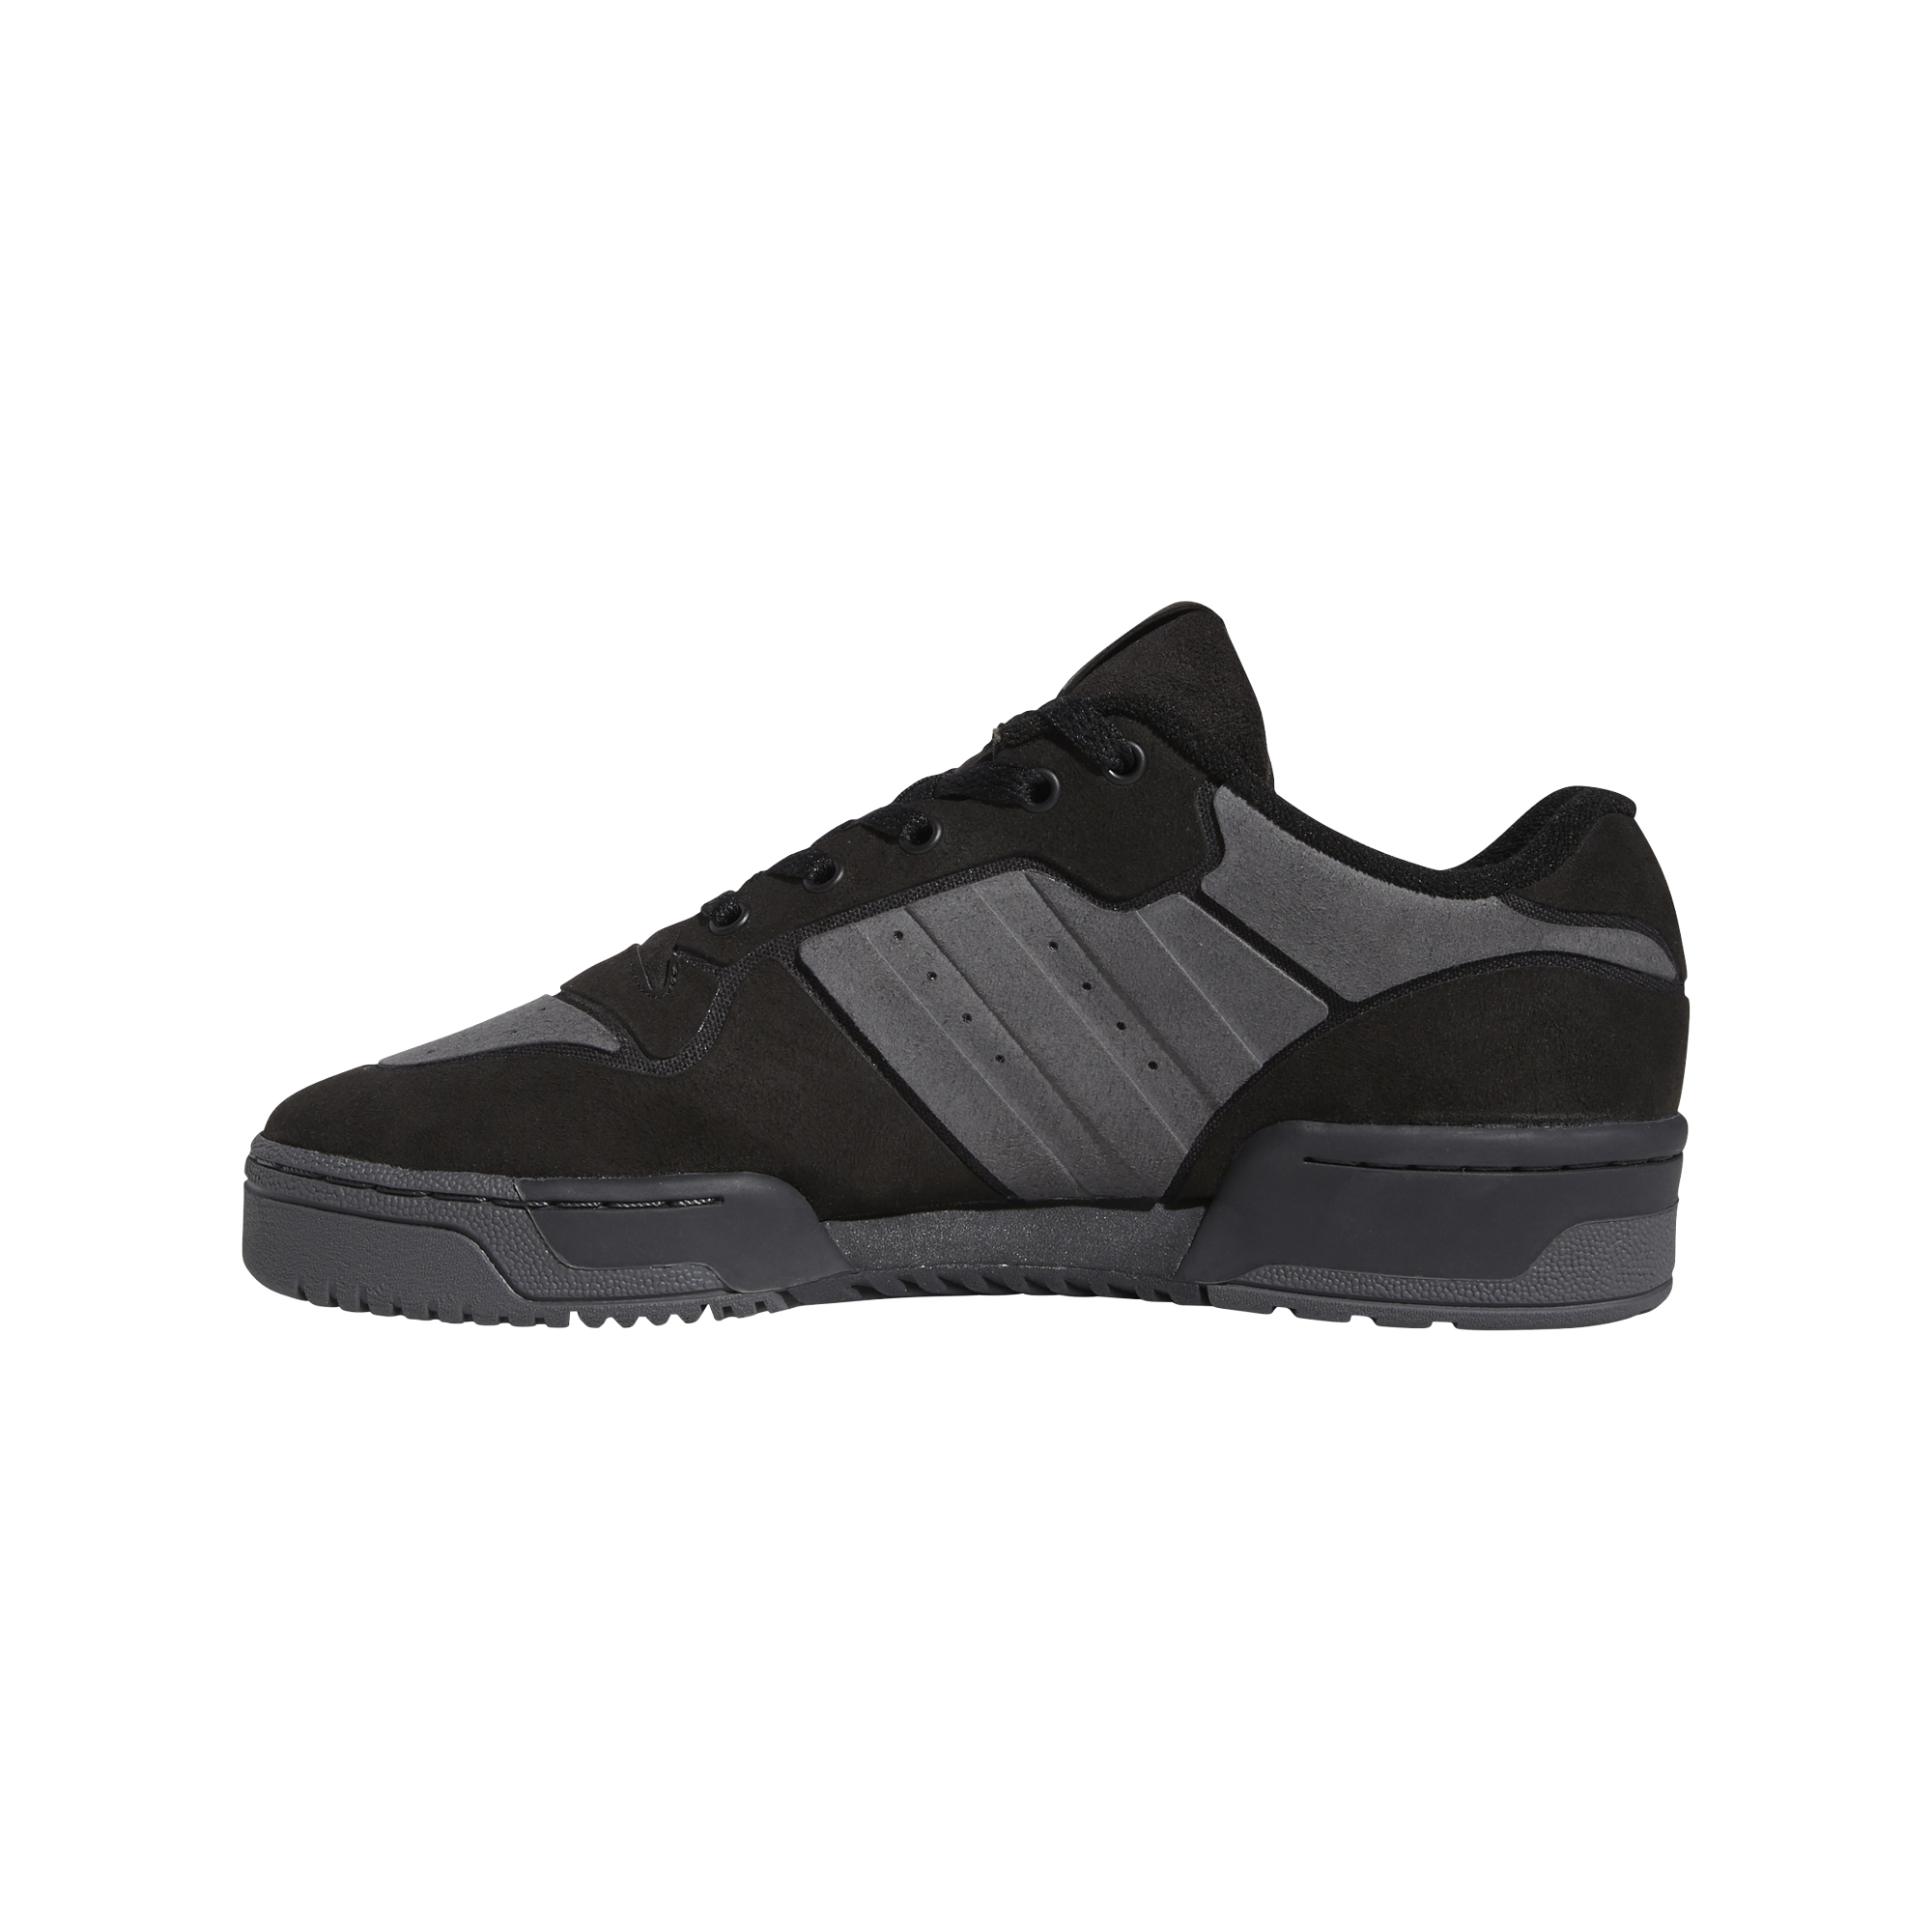 adidas Rivalry Low Core Black/ Grey Six/ Core Black FV4911